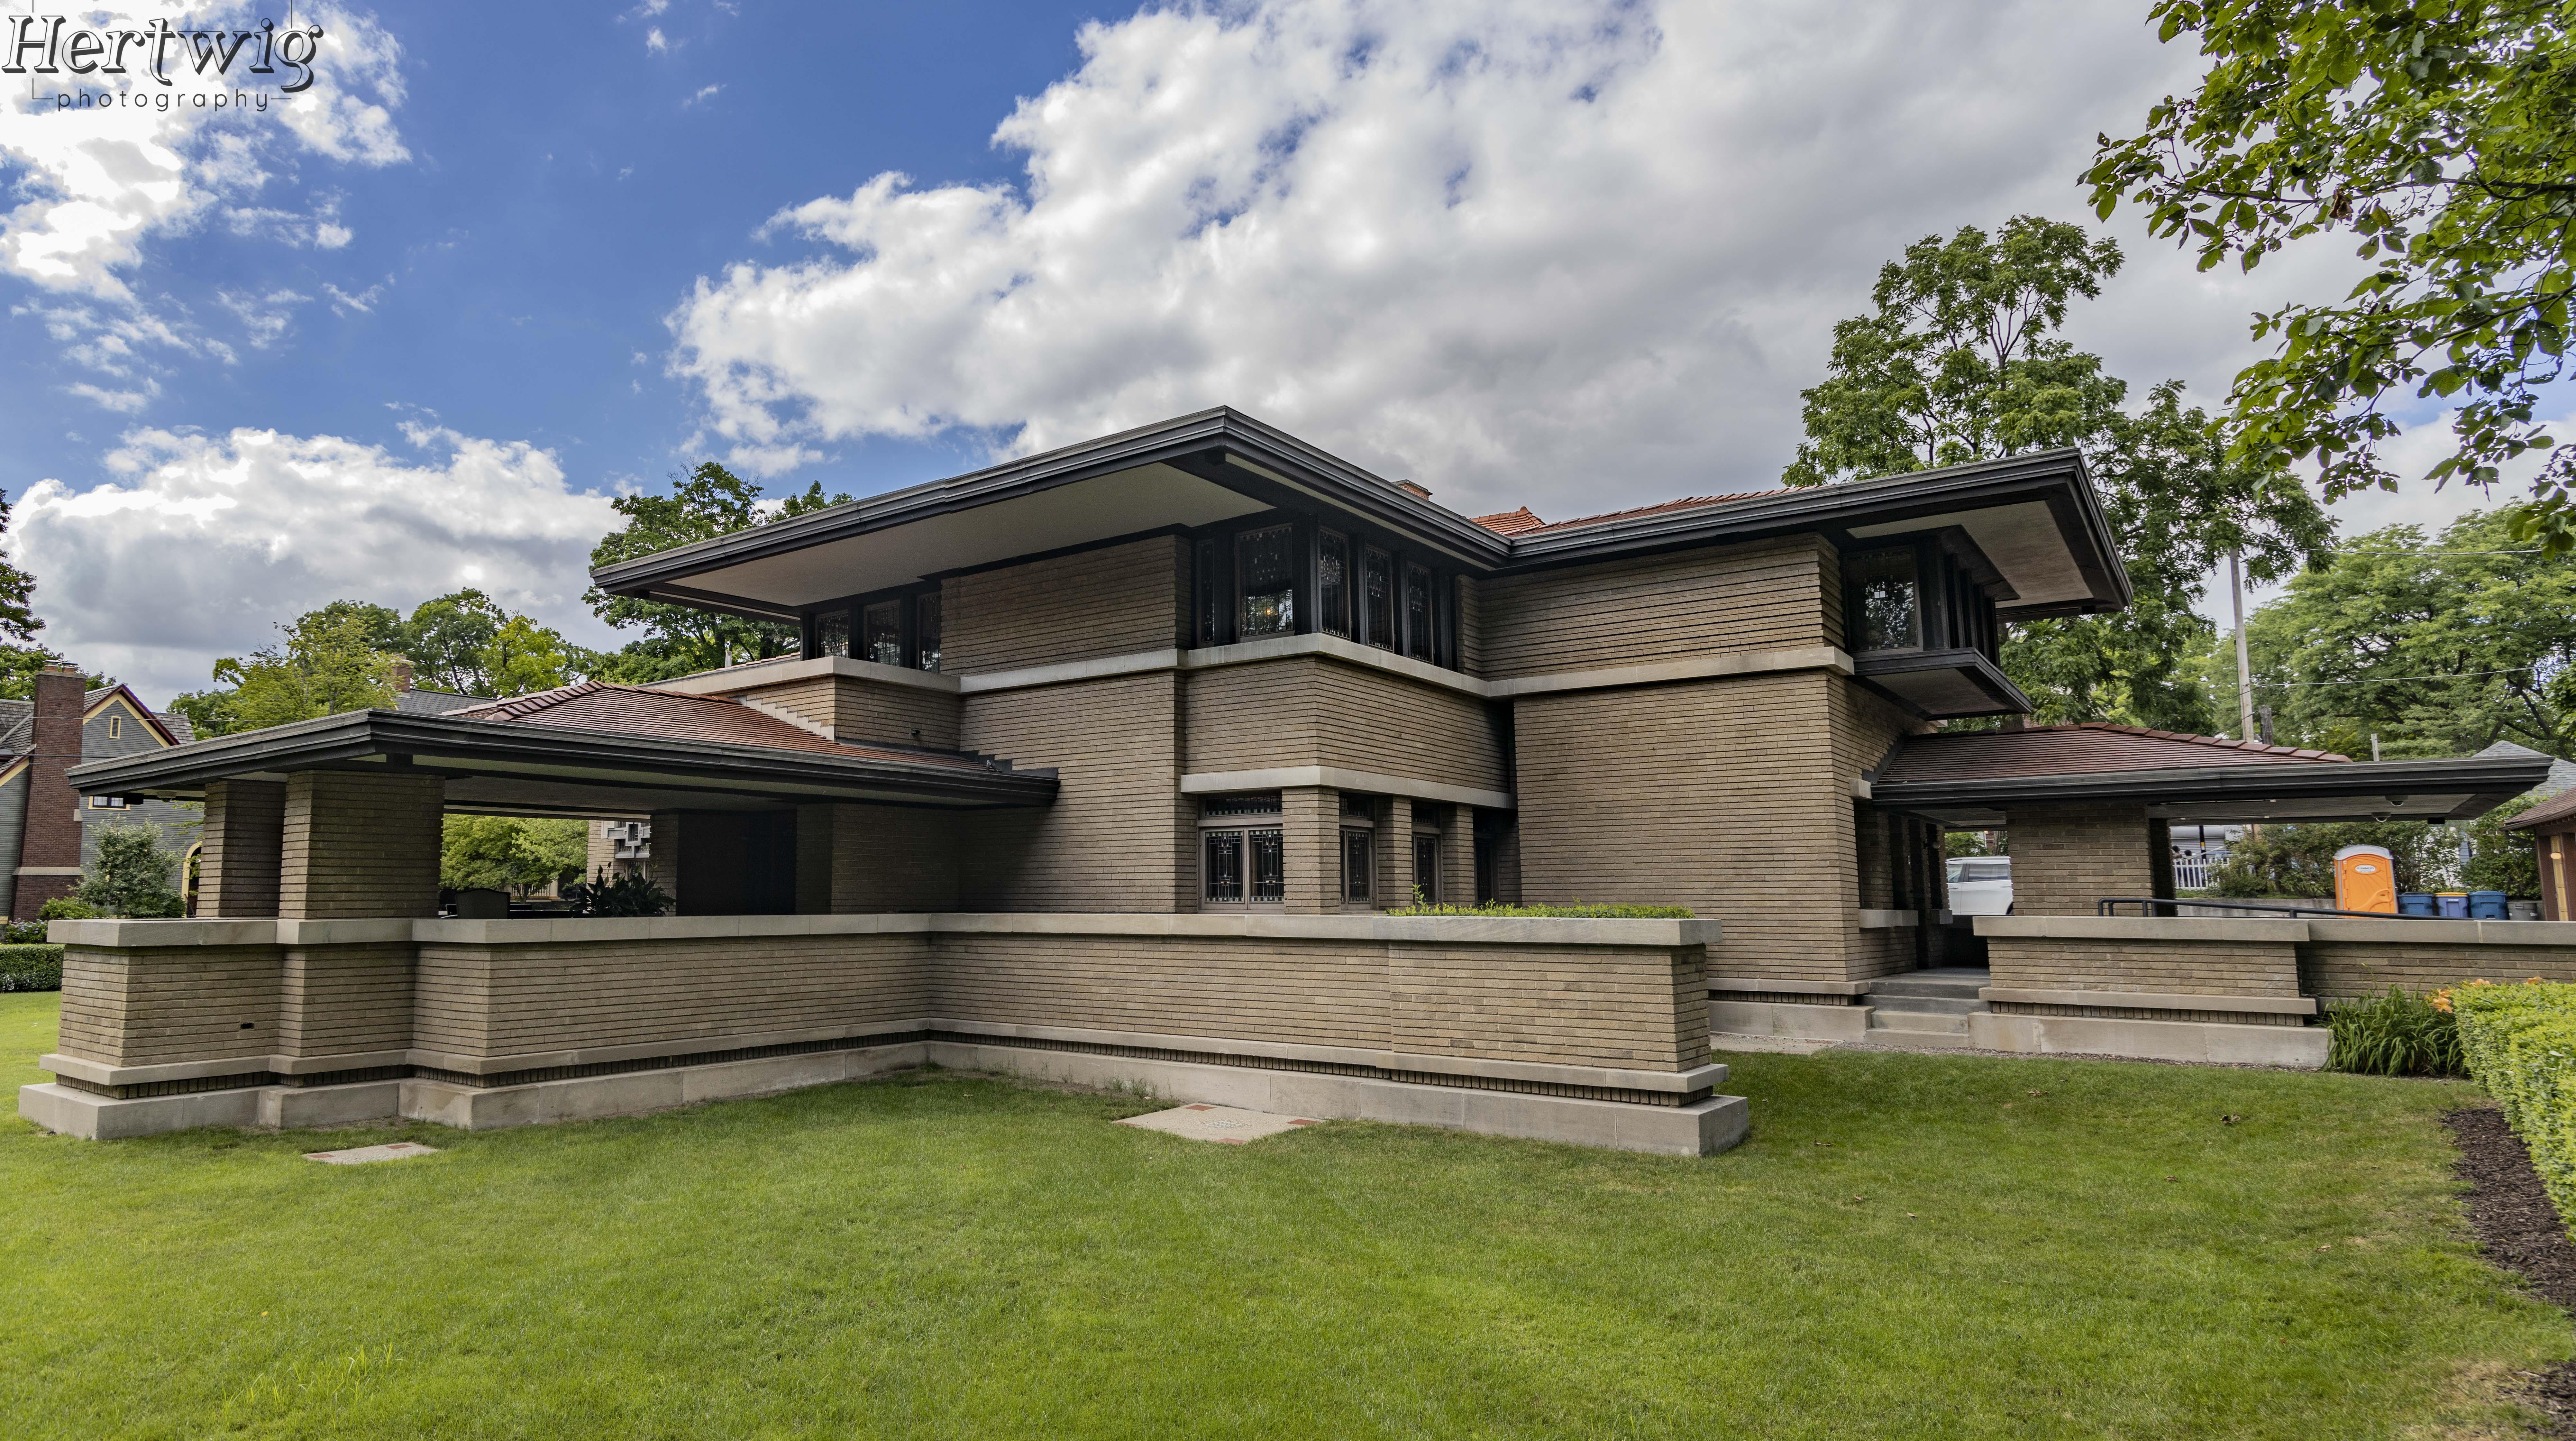 Meyer Mae House